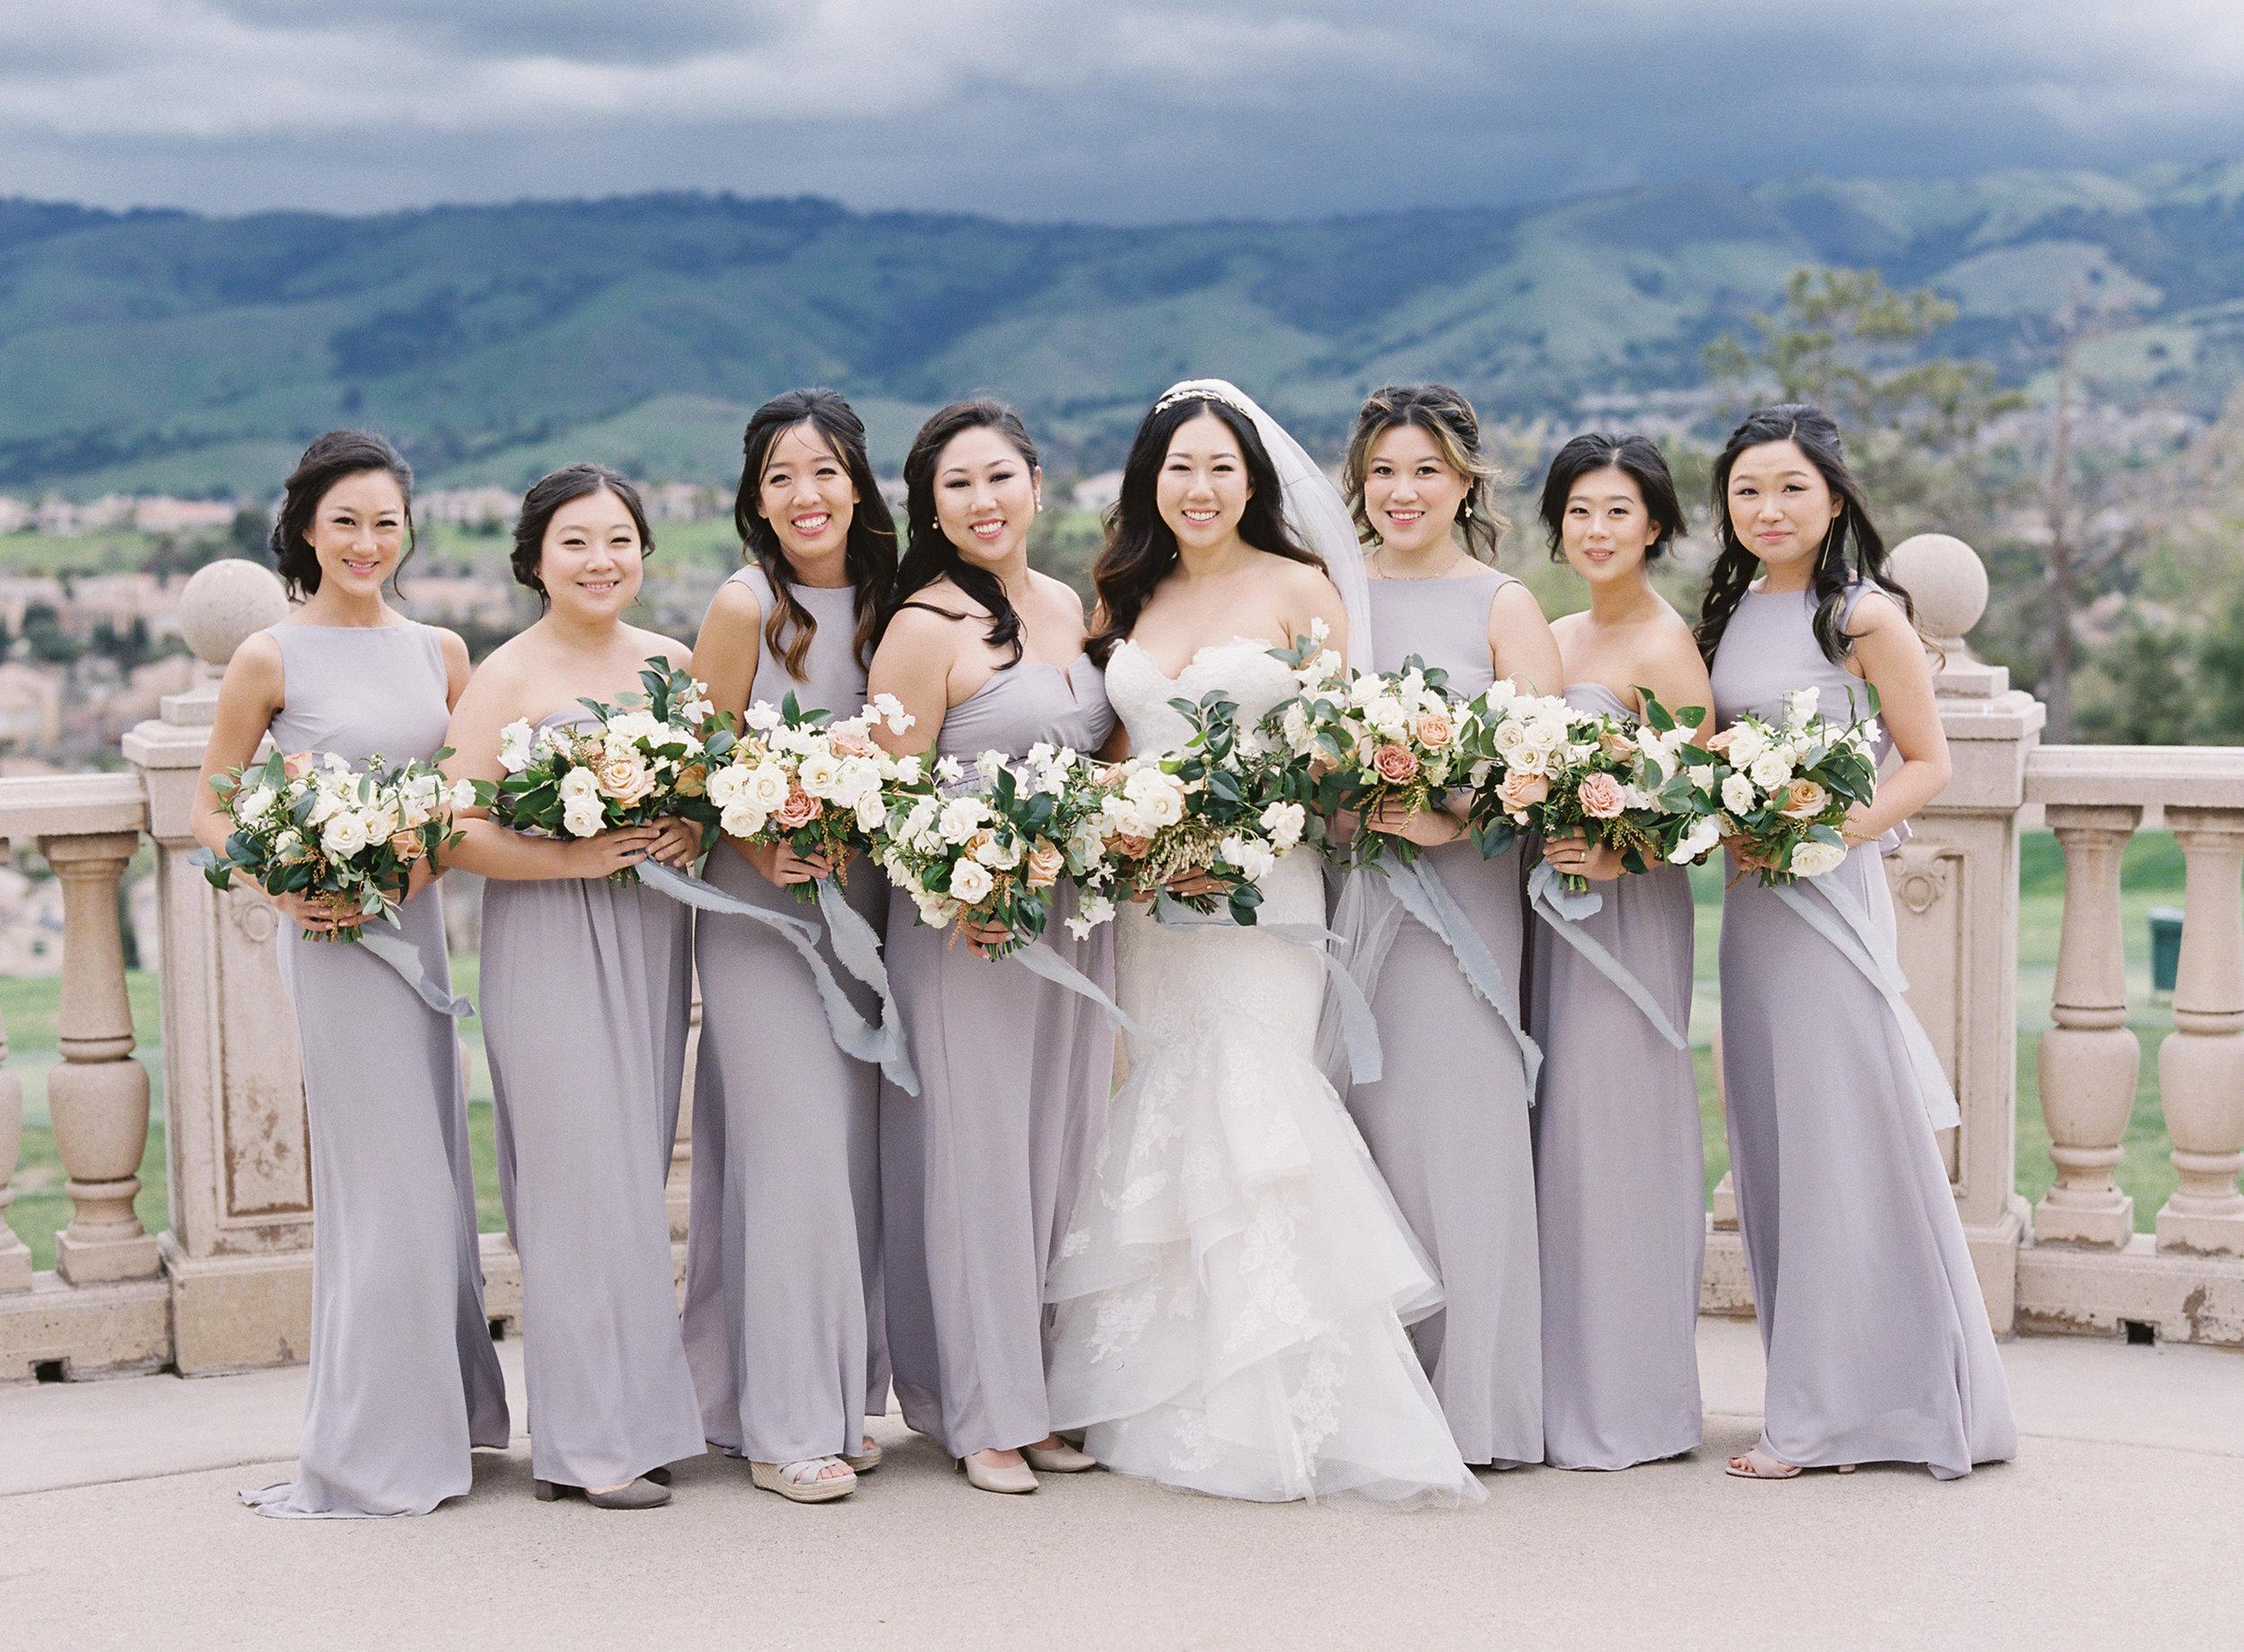 bridal_party07.jpg